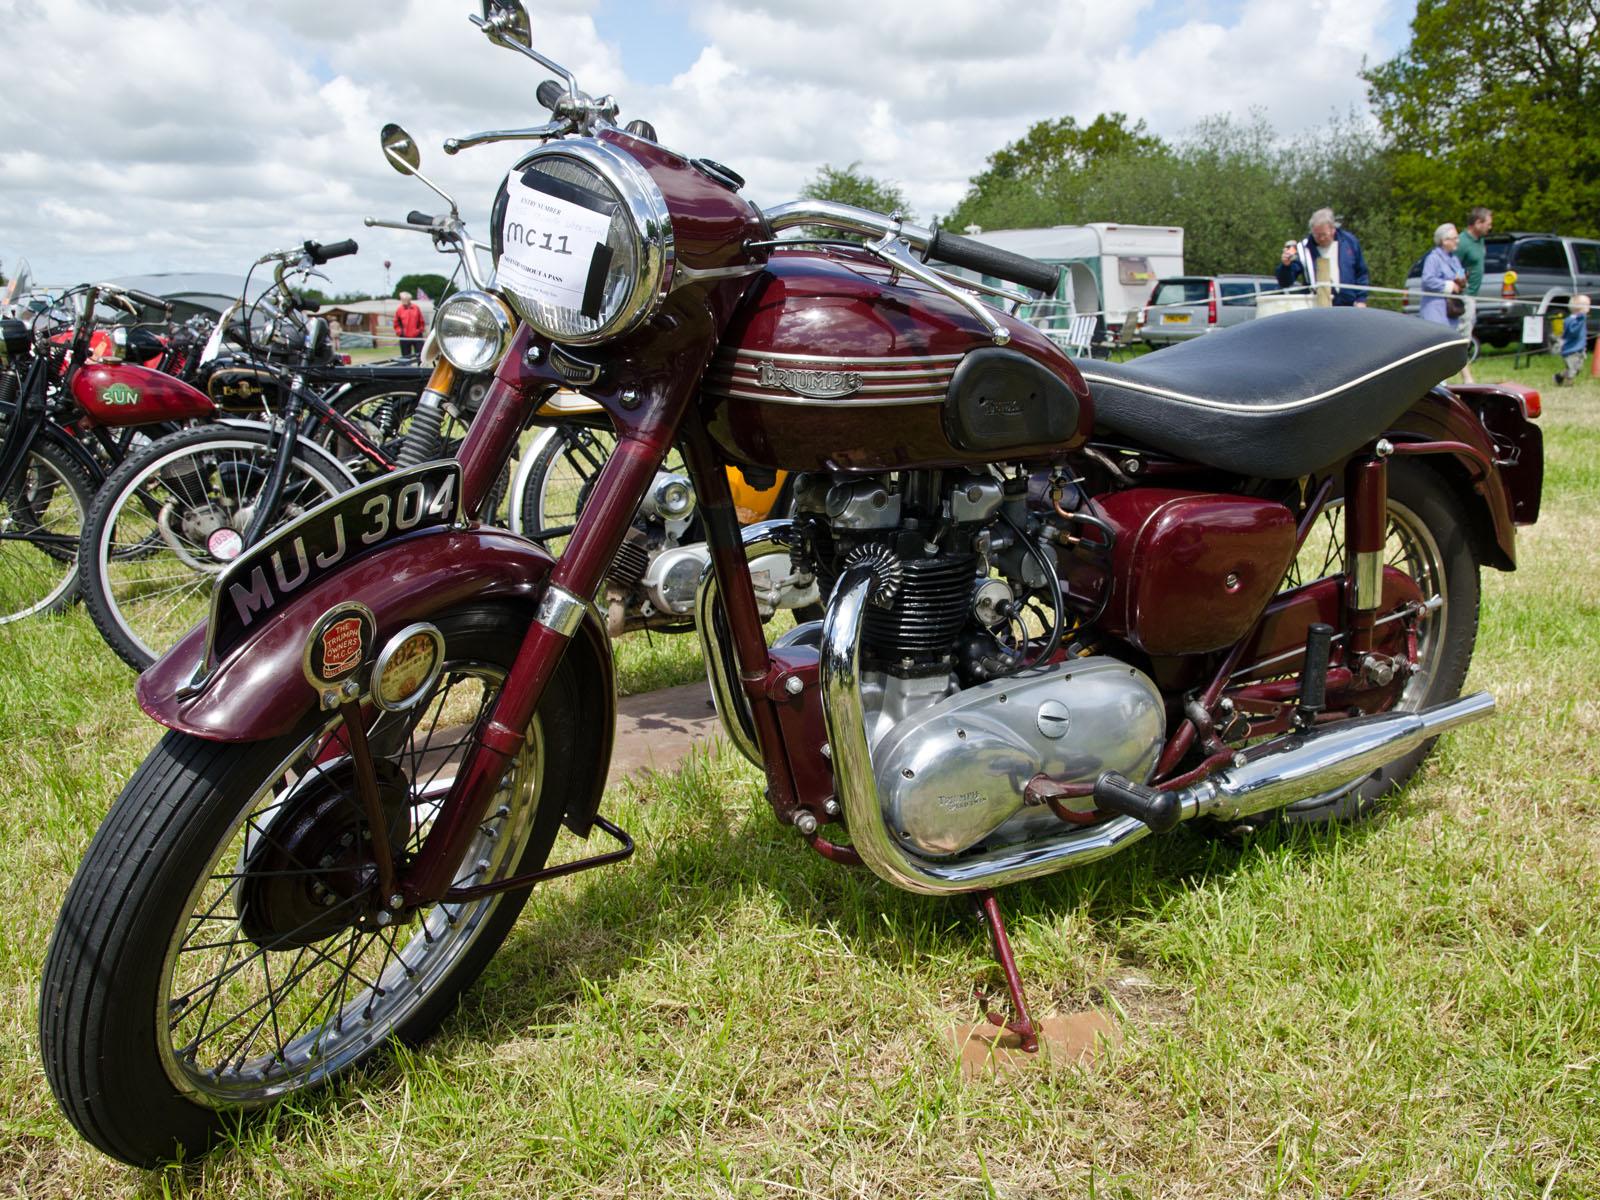 Triumph_Speed_twin_500cc_(1955)_-_913879